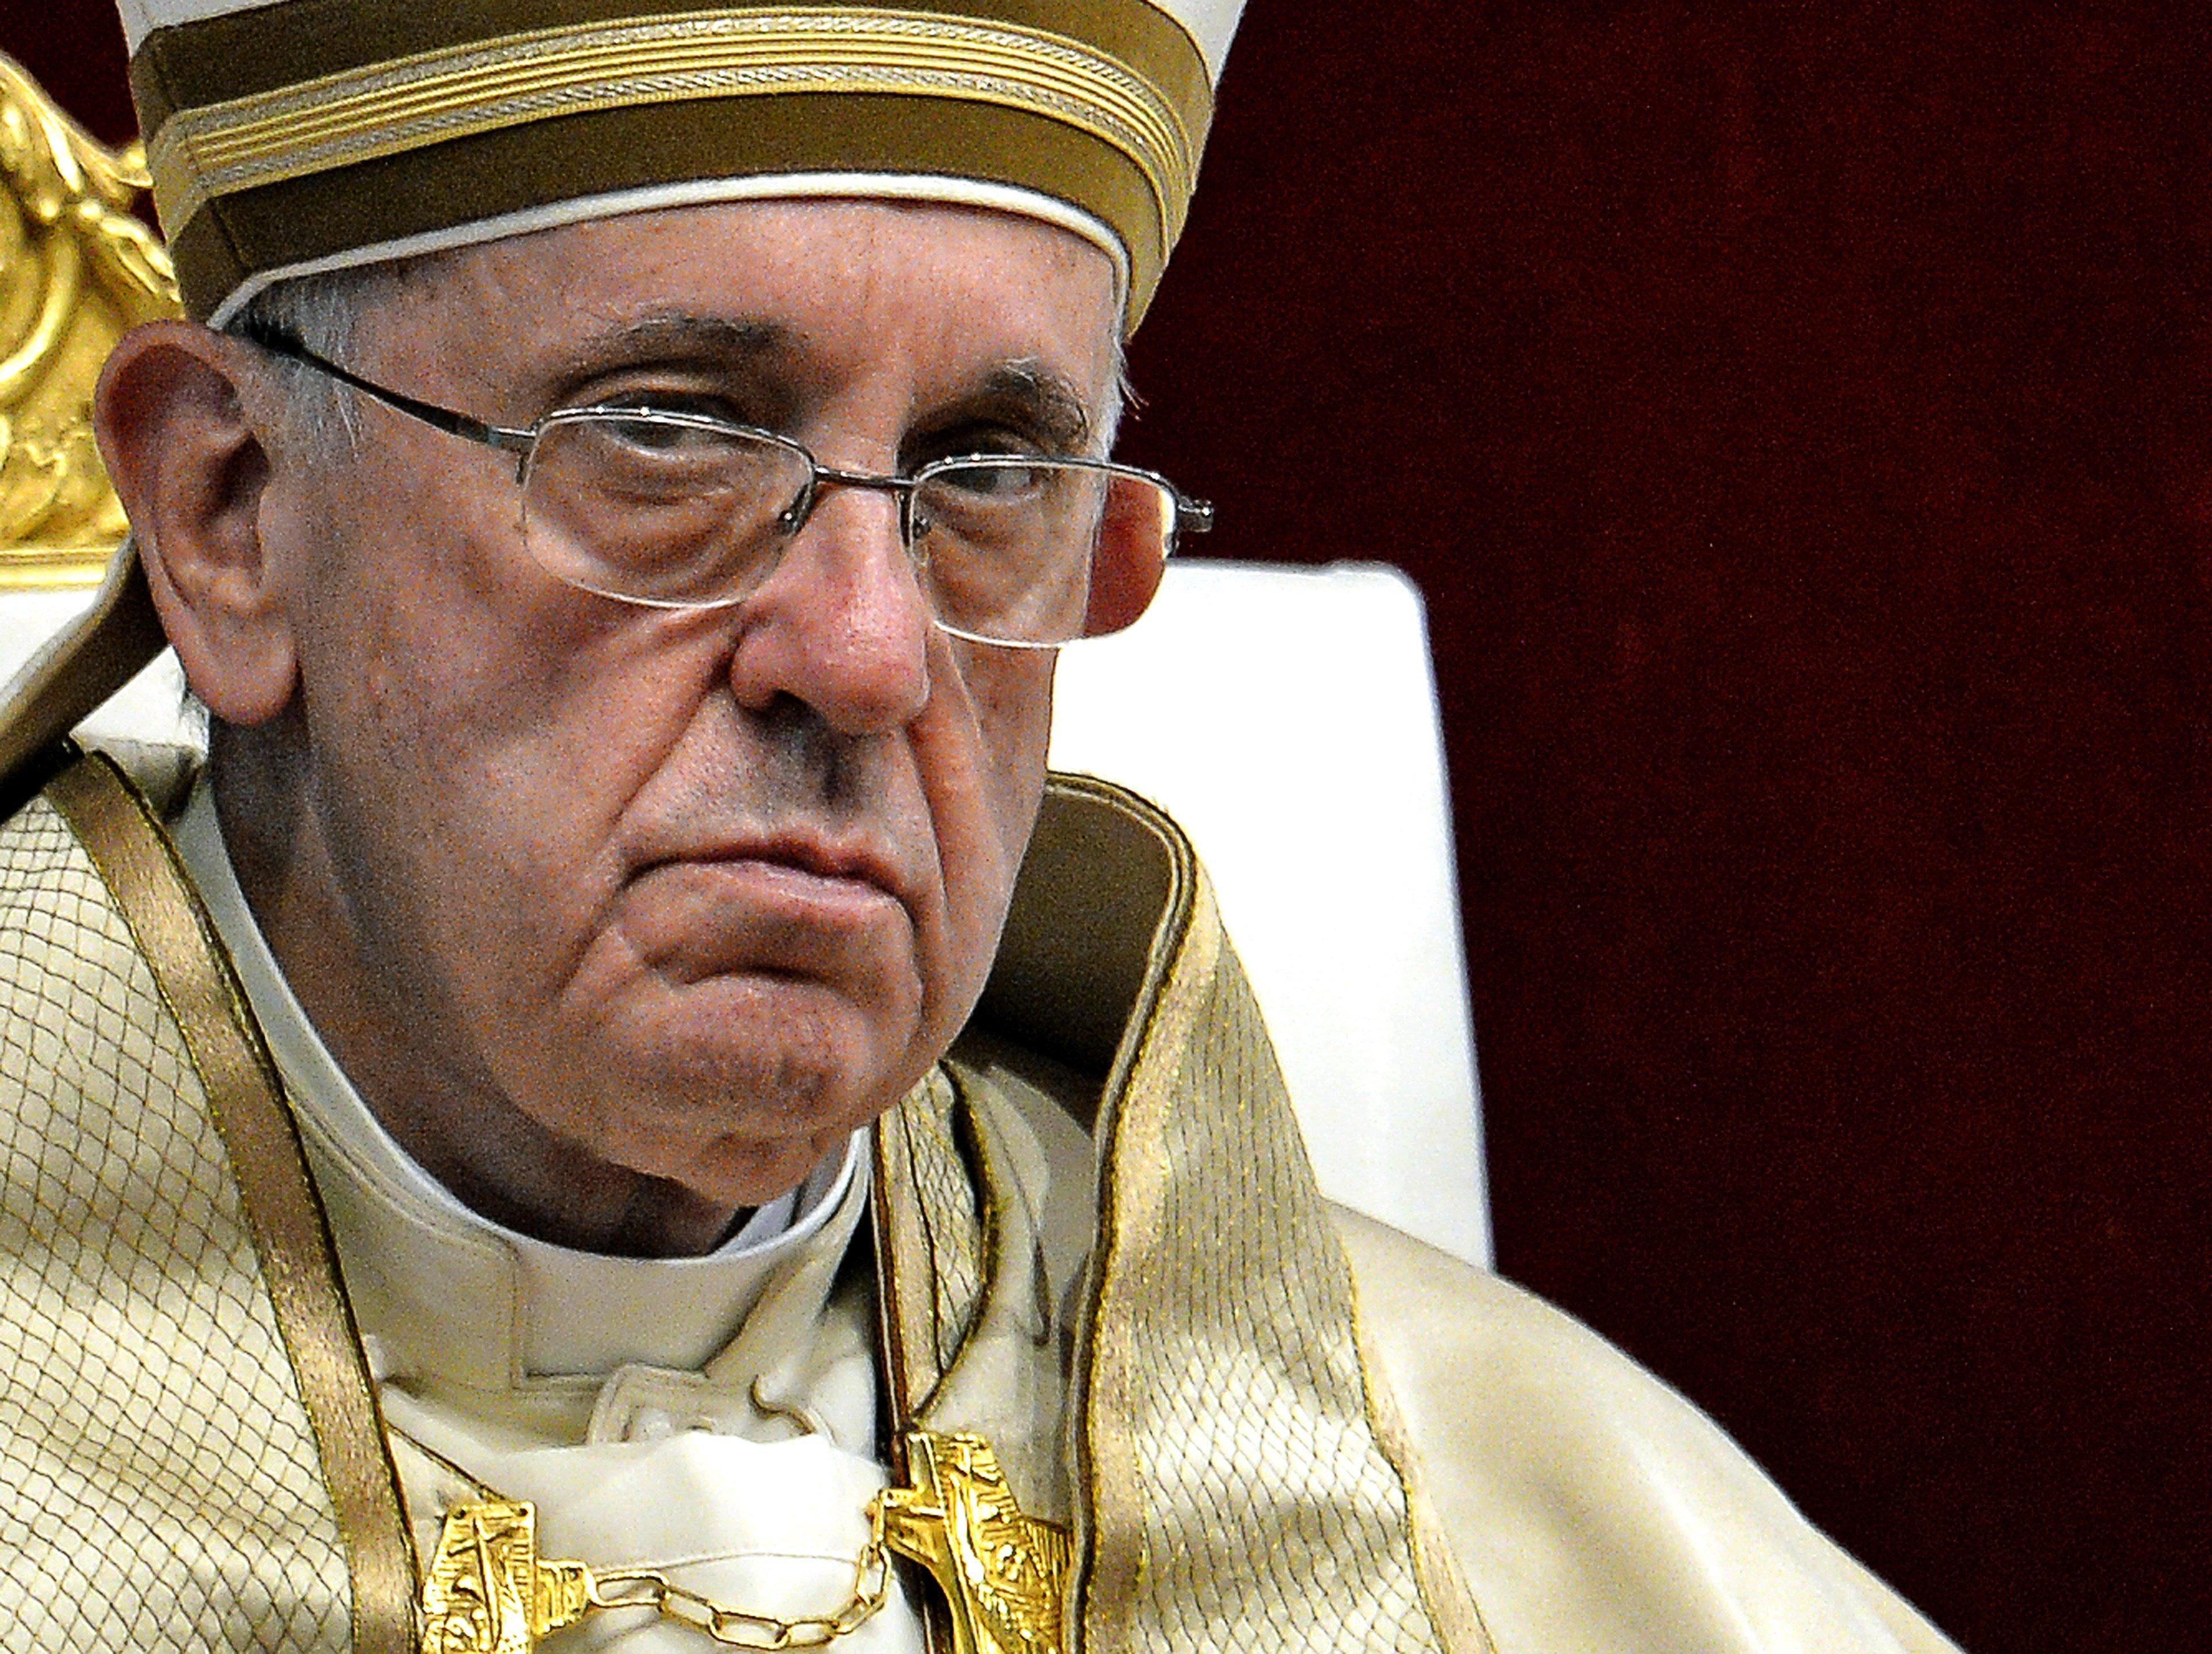 "Francis has upheld church teaching opposing abortion and echoed his predecessors in <a href=""http://en.radiovaticana.va/stori"